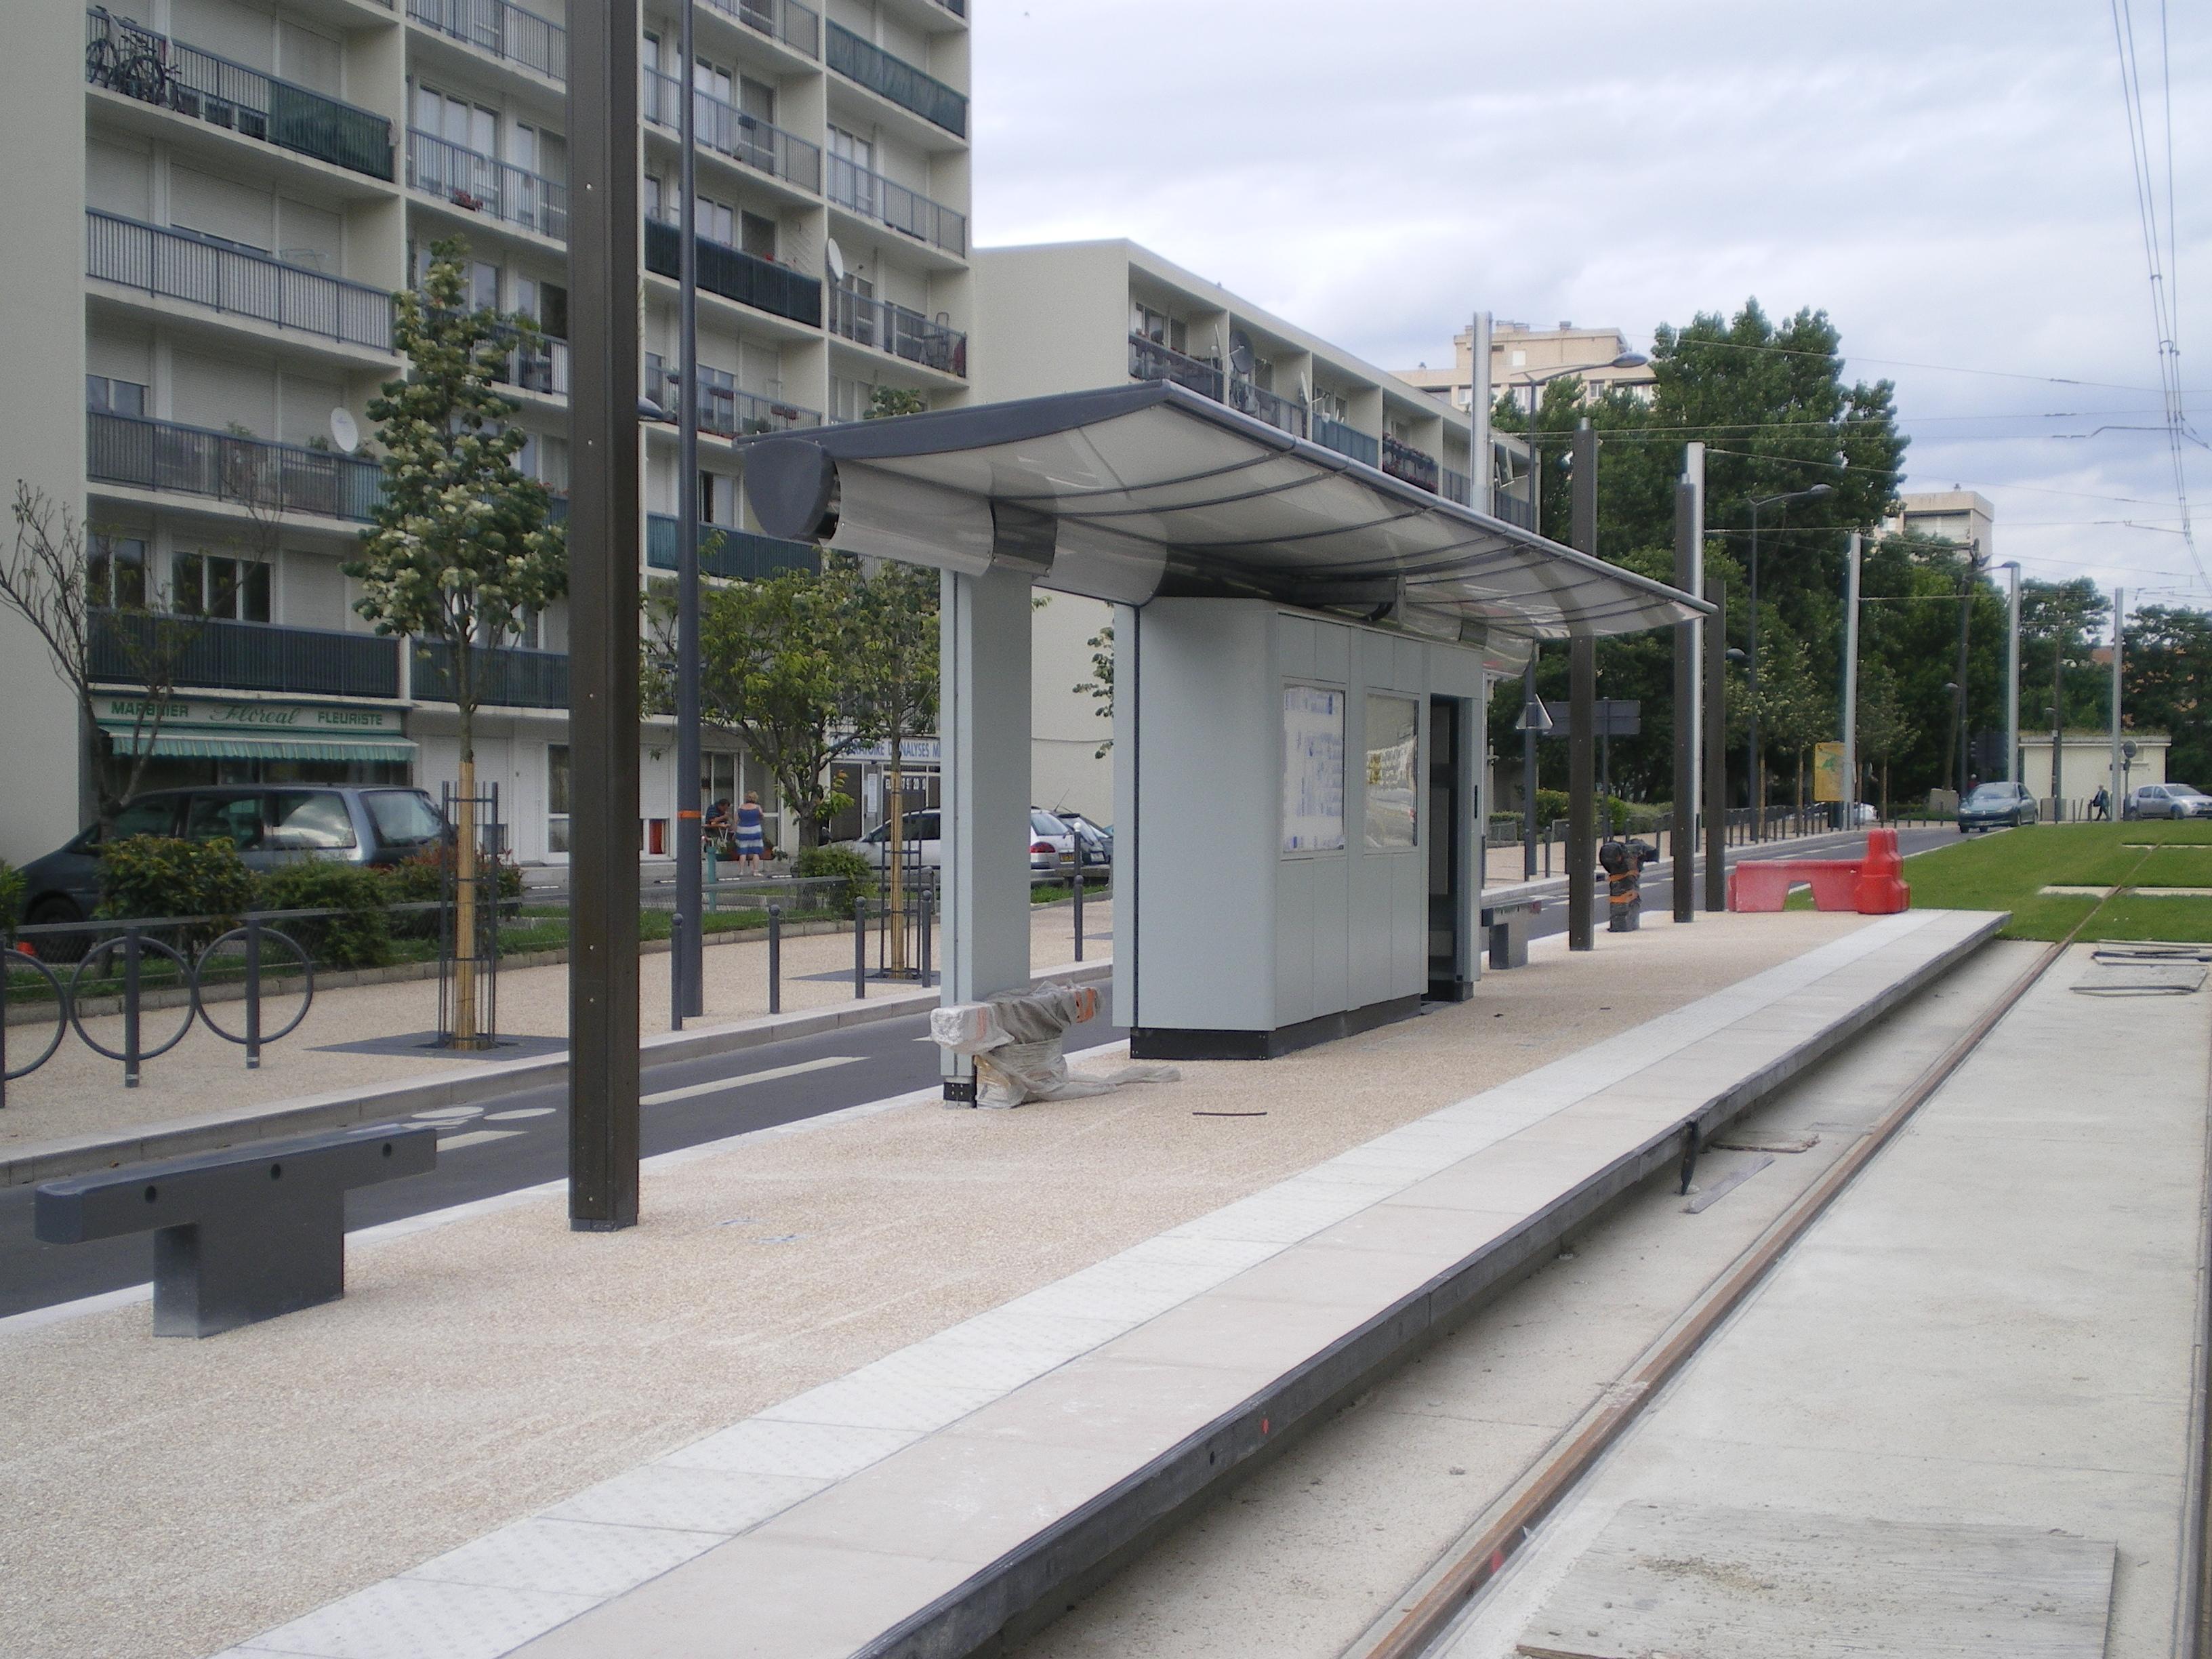 file travaux t1 ouest station mairie de villeneuve la garenne juillet 2012 3 jpg. Black Bedroom Furniture Sets. Home Design Ideas